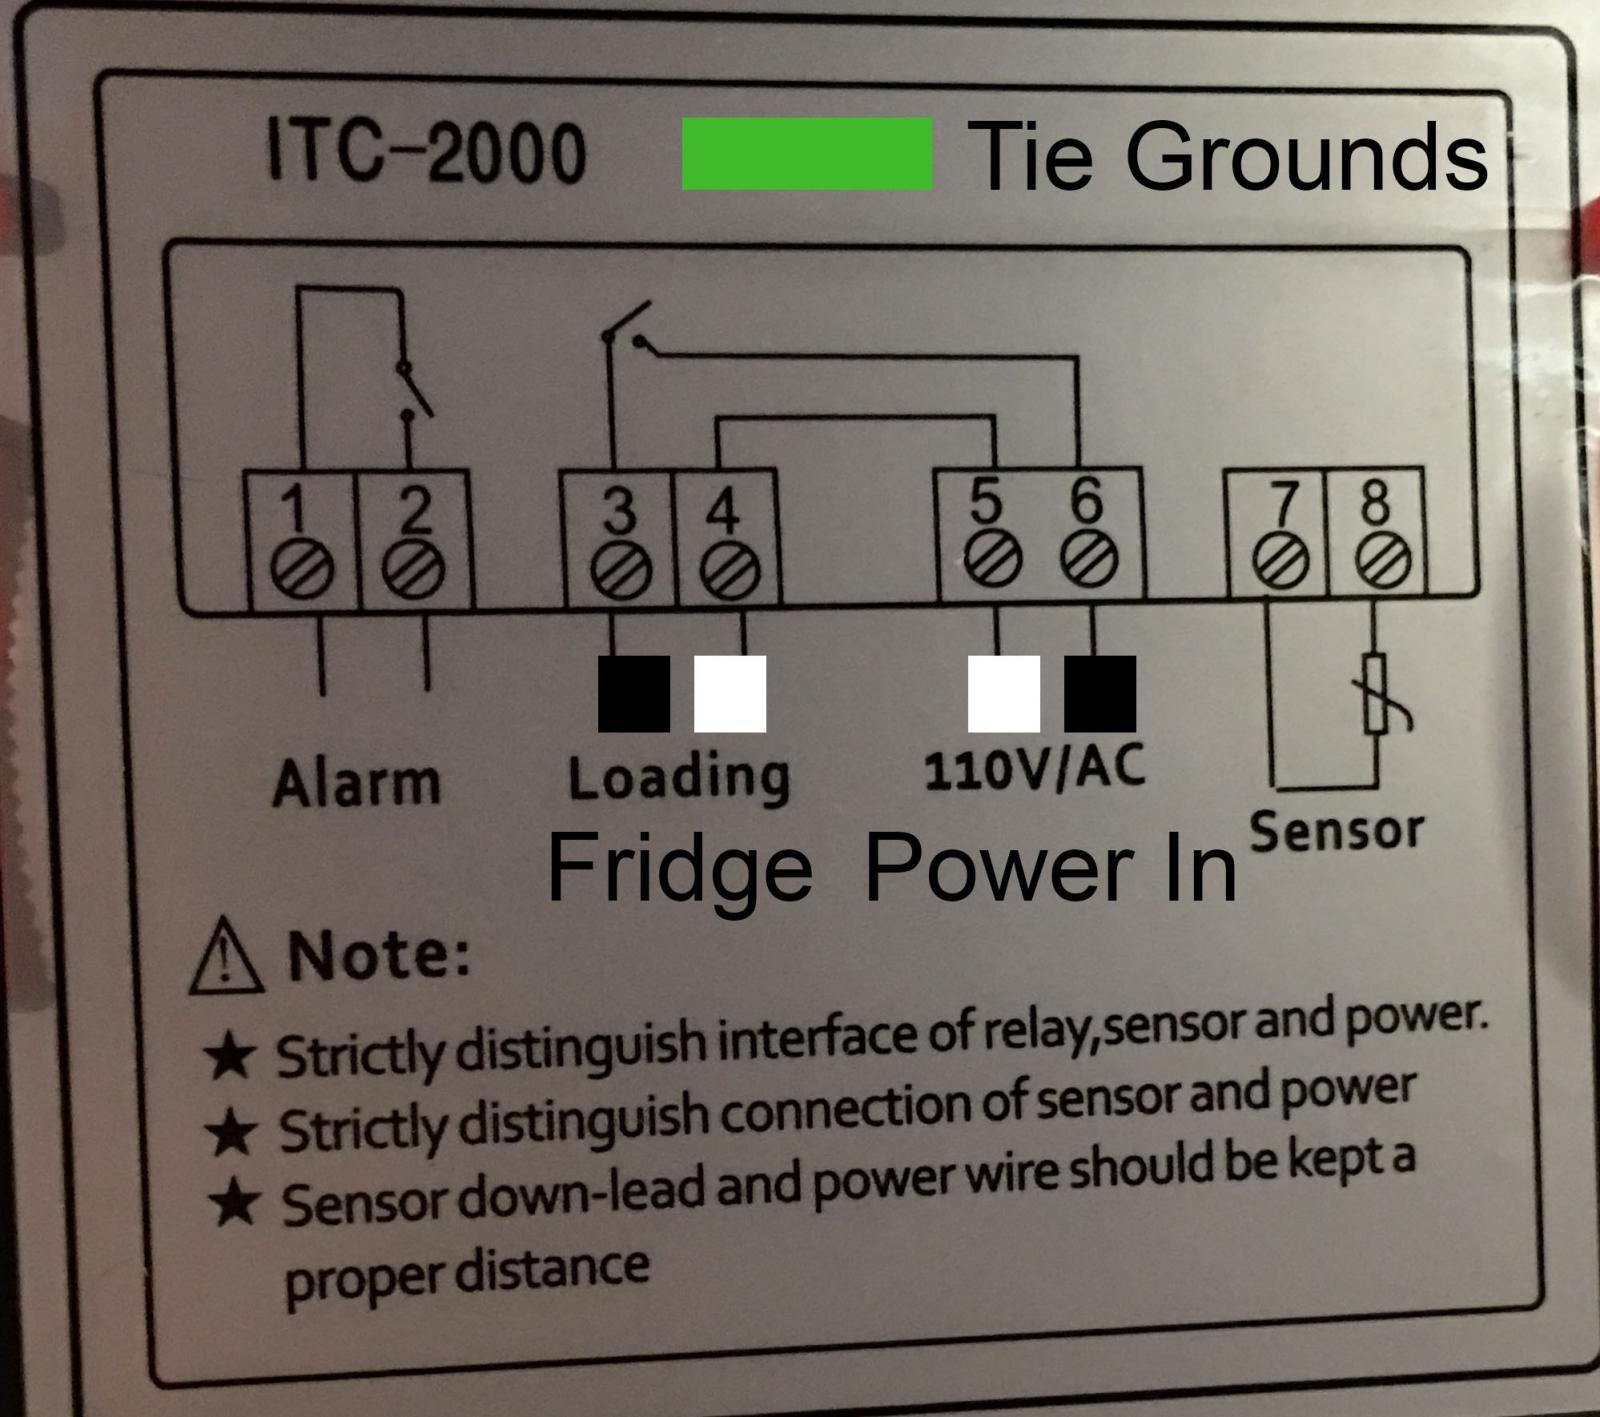 hight resolution of itc 2000wiring jpg